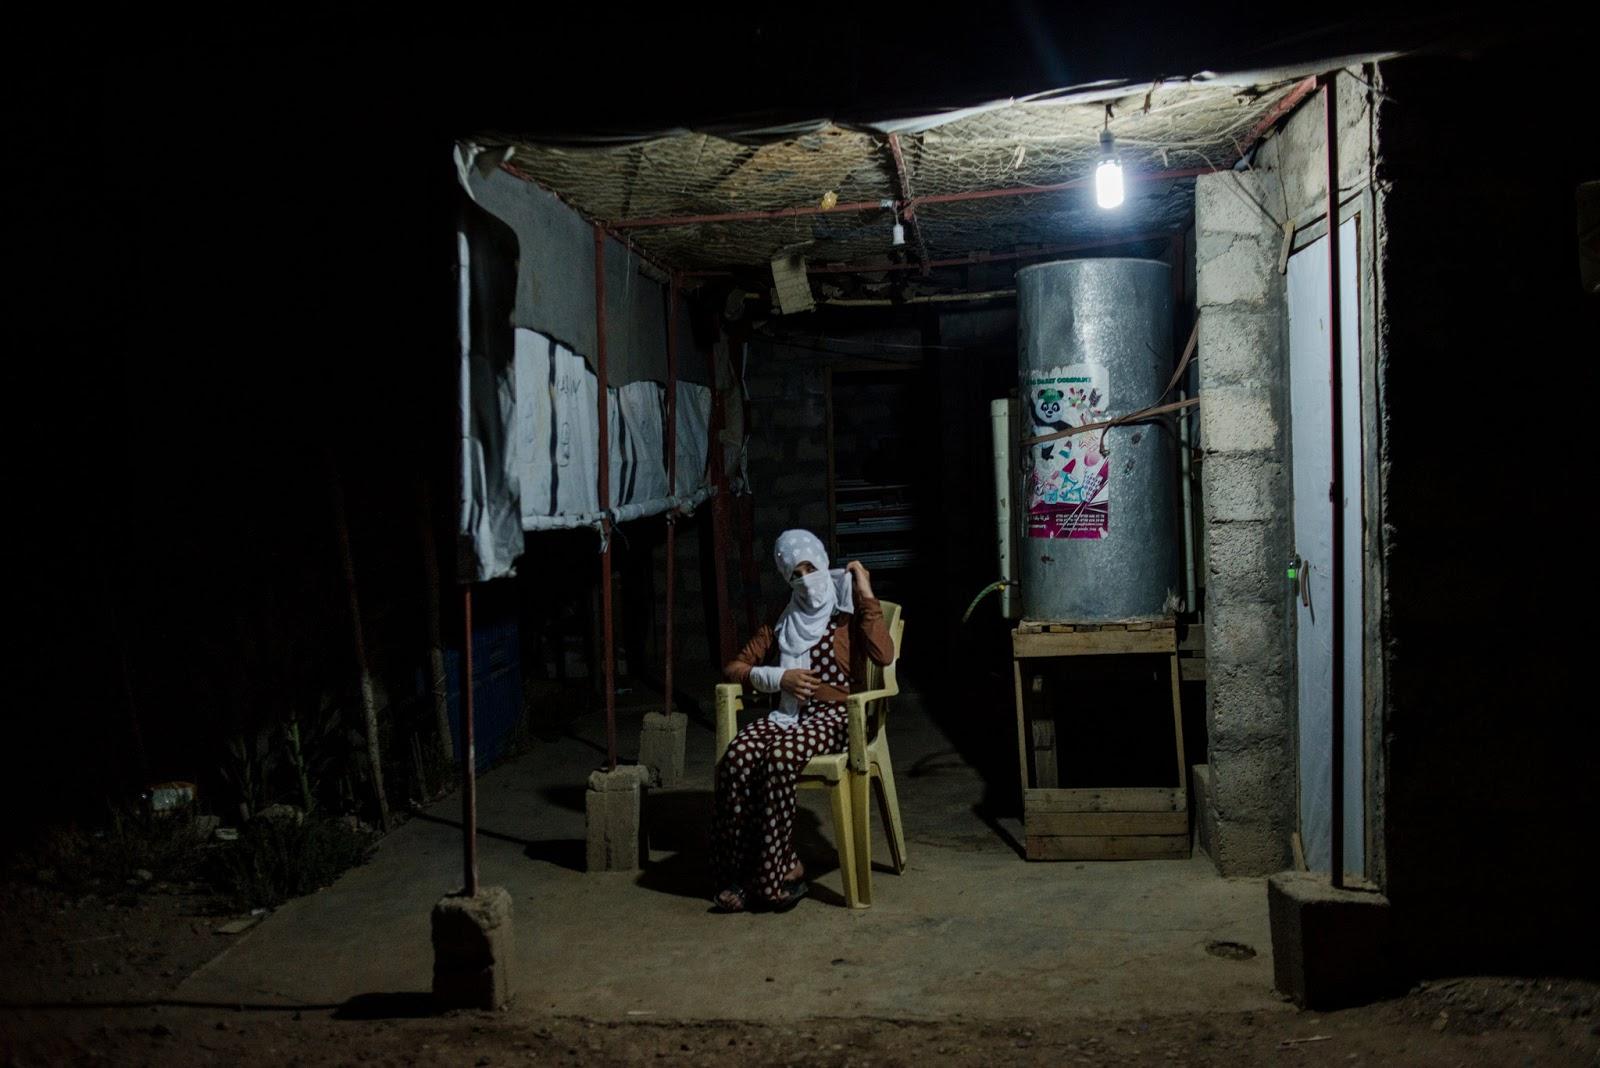 Freed From ISIS, Yazidi Women Return in 'Severe Shock'